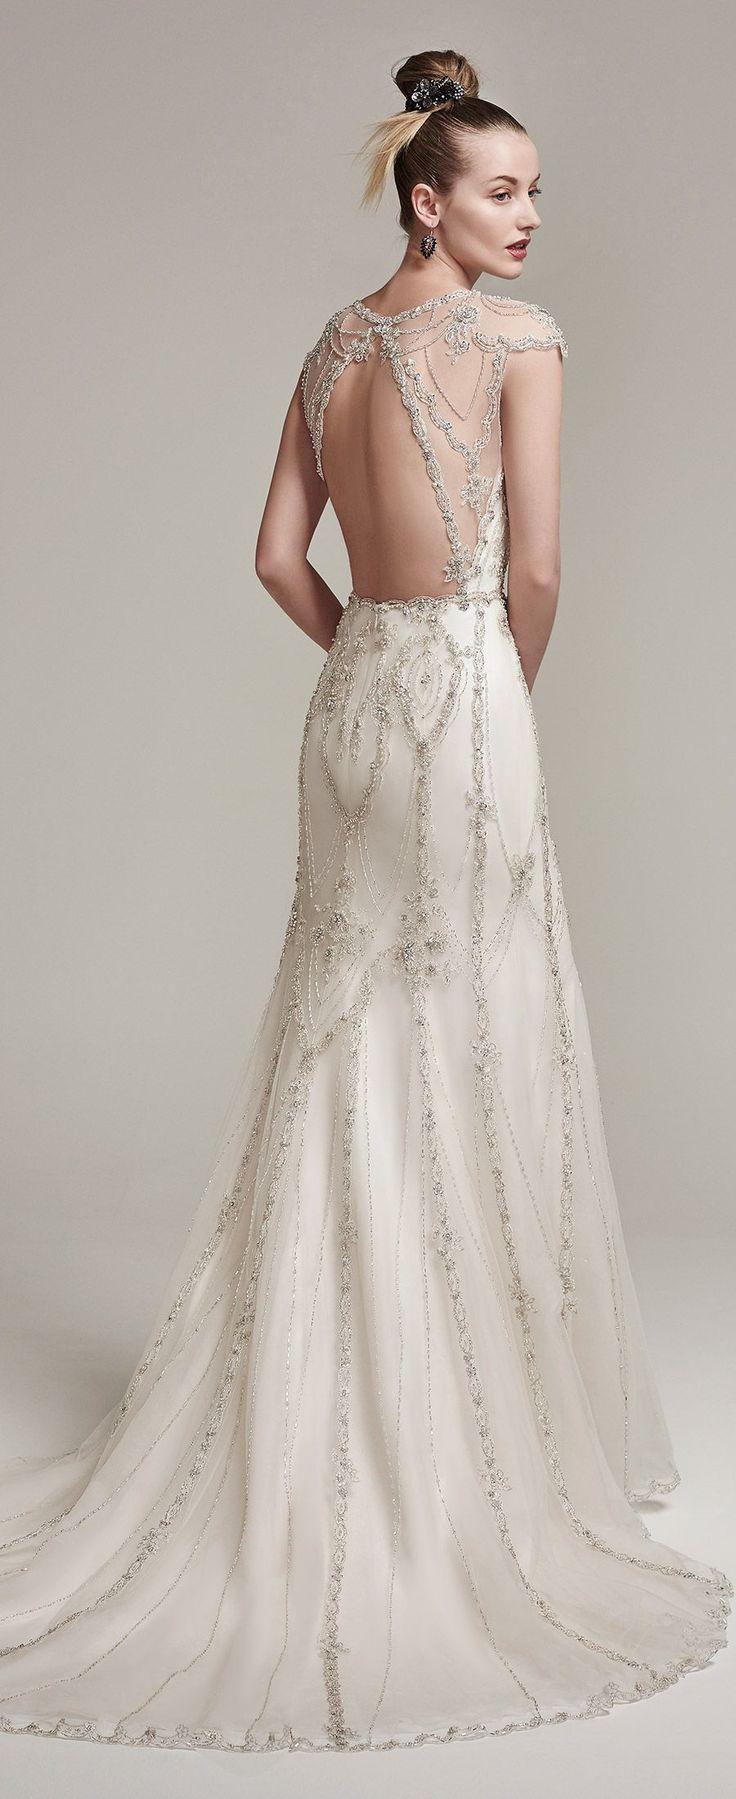 Best 25 art deco wedding dress ideas on pinterest 1920s wedding vintage inspired art deco wedding dress gown beaded sequins romantic junglespirit Gallery